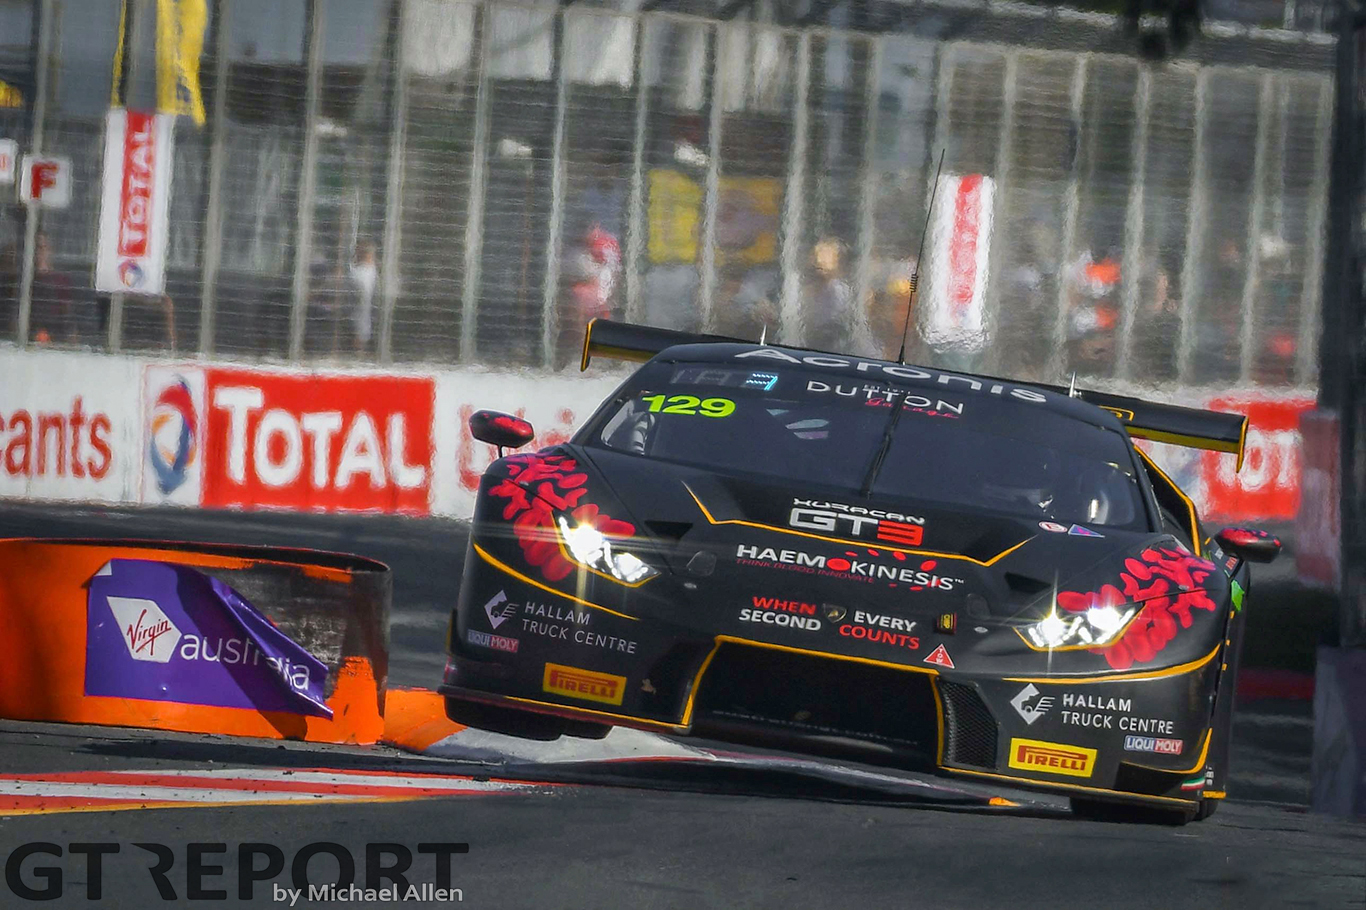 Sydney Motorsport Park to host Australian GT return; Ryan Simpson announces Mercedes-AMG campaign